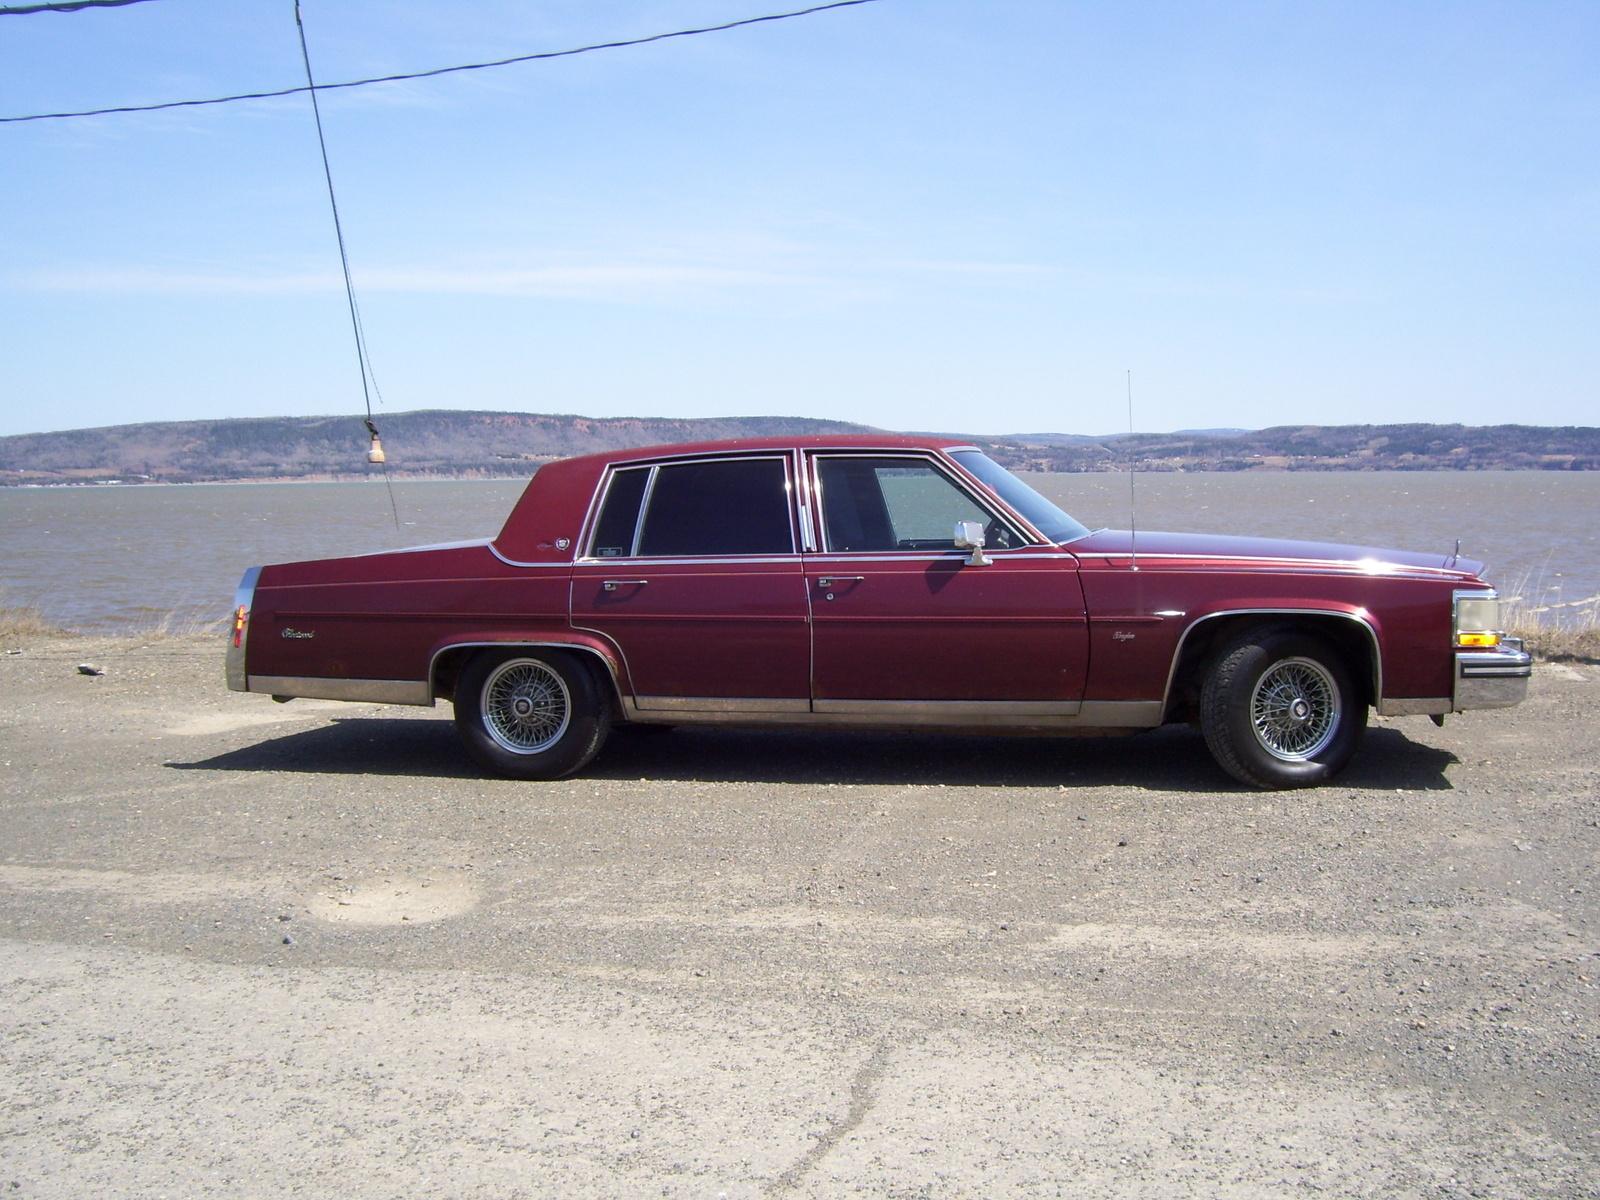 1987 Cadillac Fleetwood - Overview - CarGurus